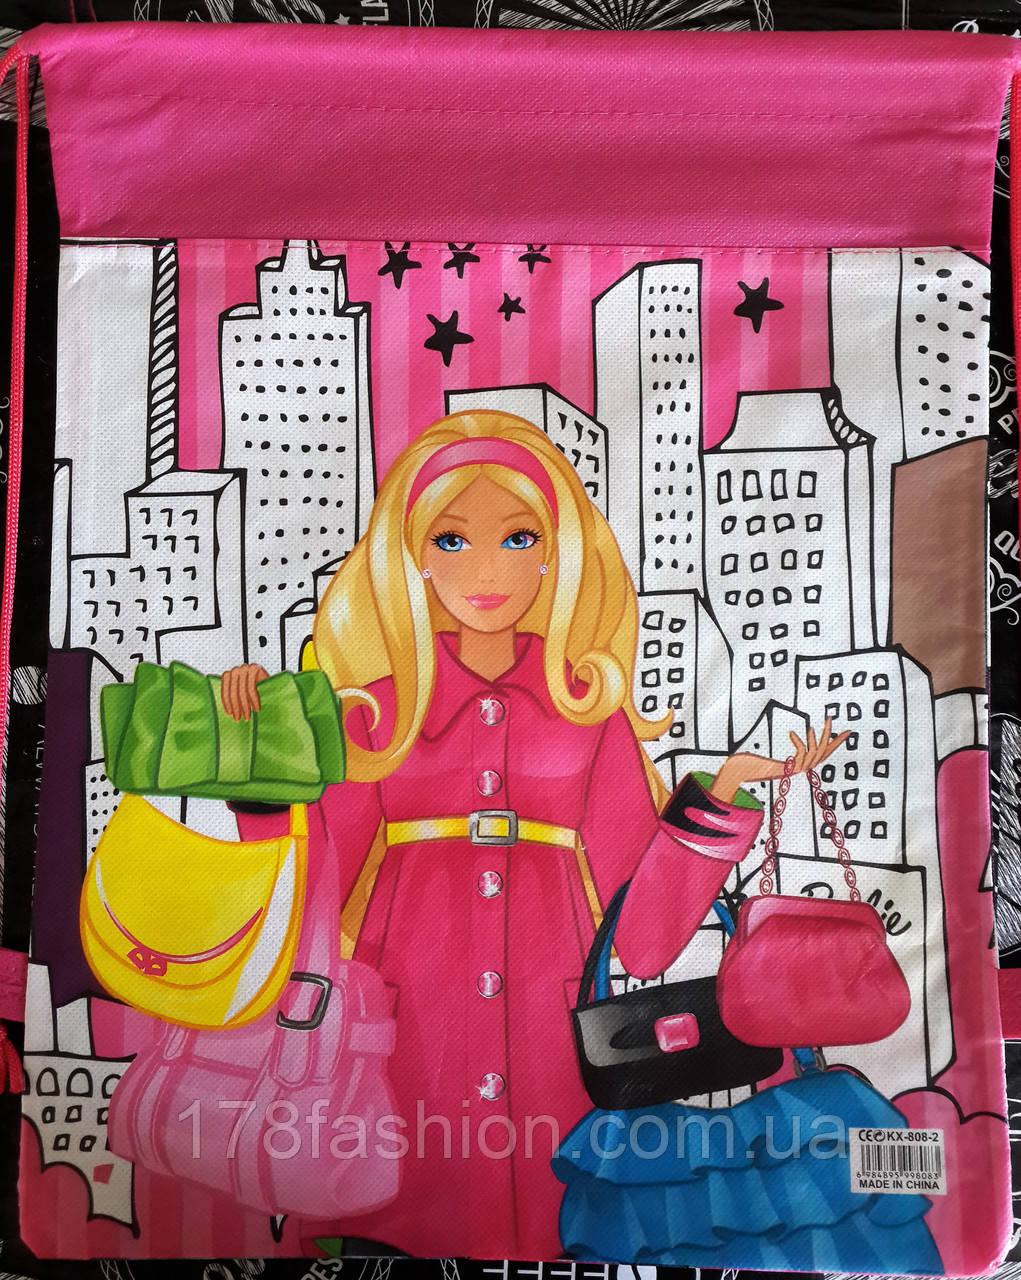 Сумка-рюкзак c героем DISNEY Barbie на шопинге